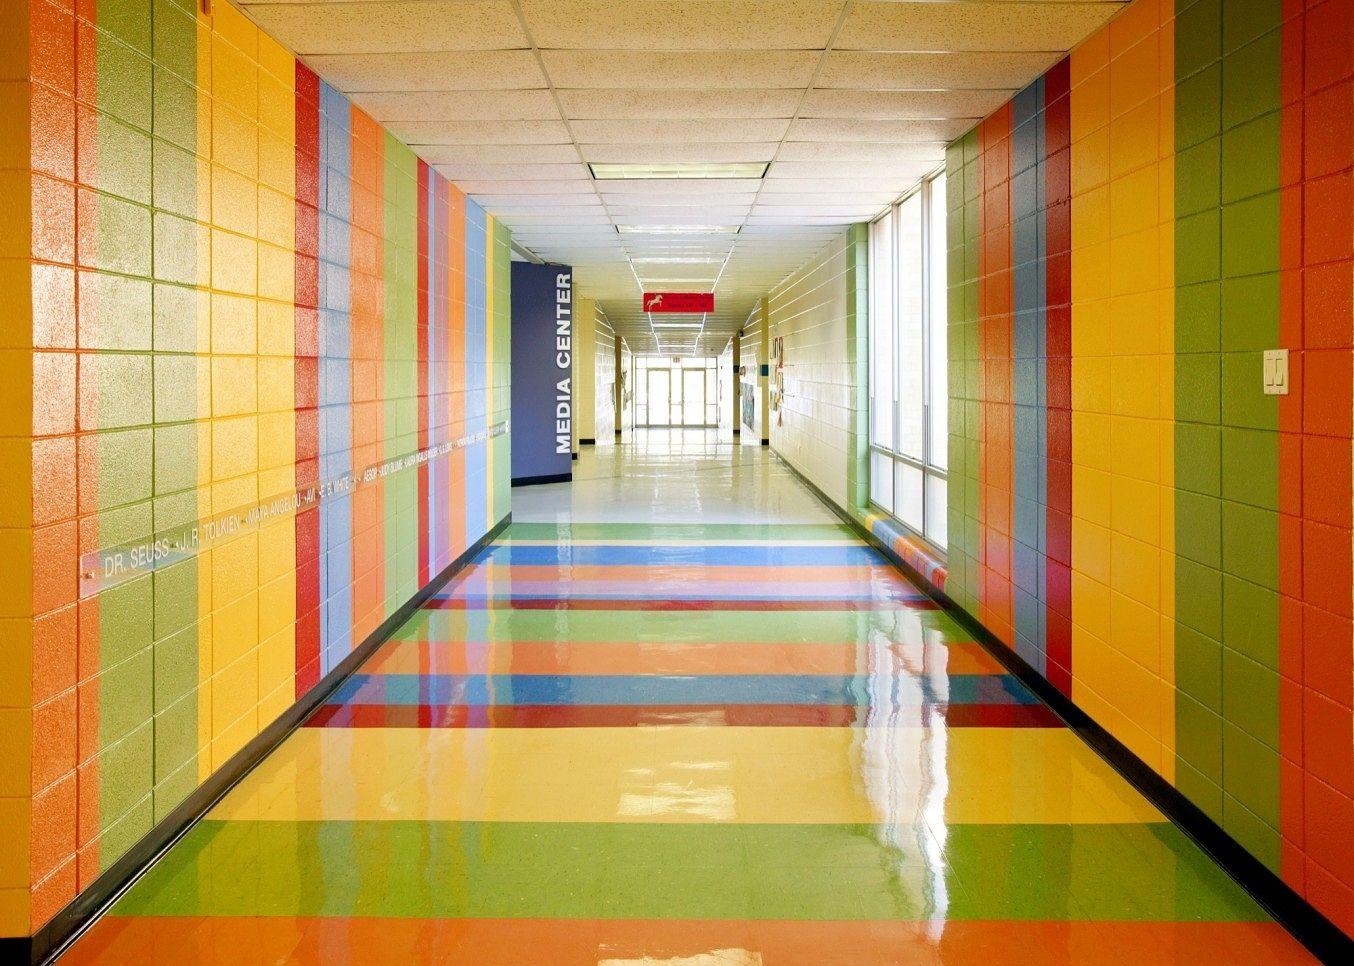 Mabelvale Elementary School Media Center Elementary Schools